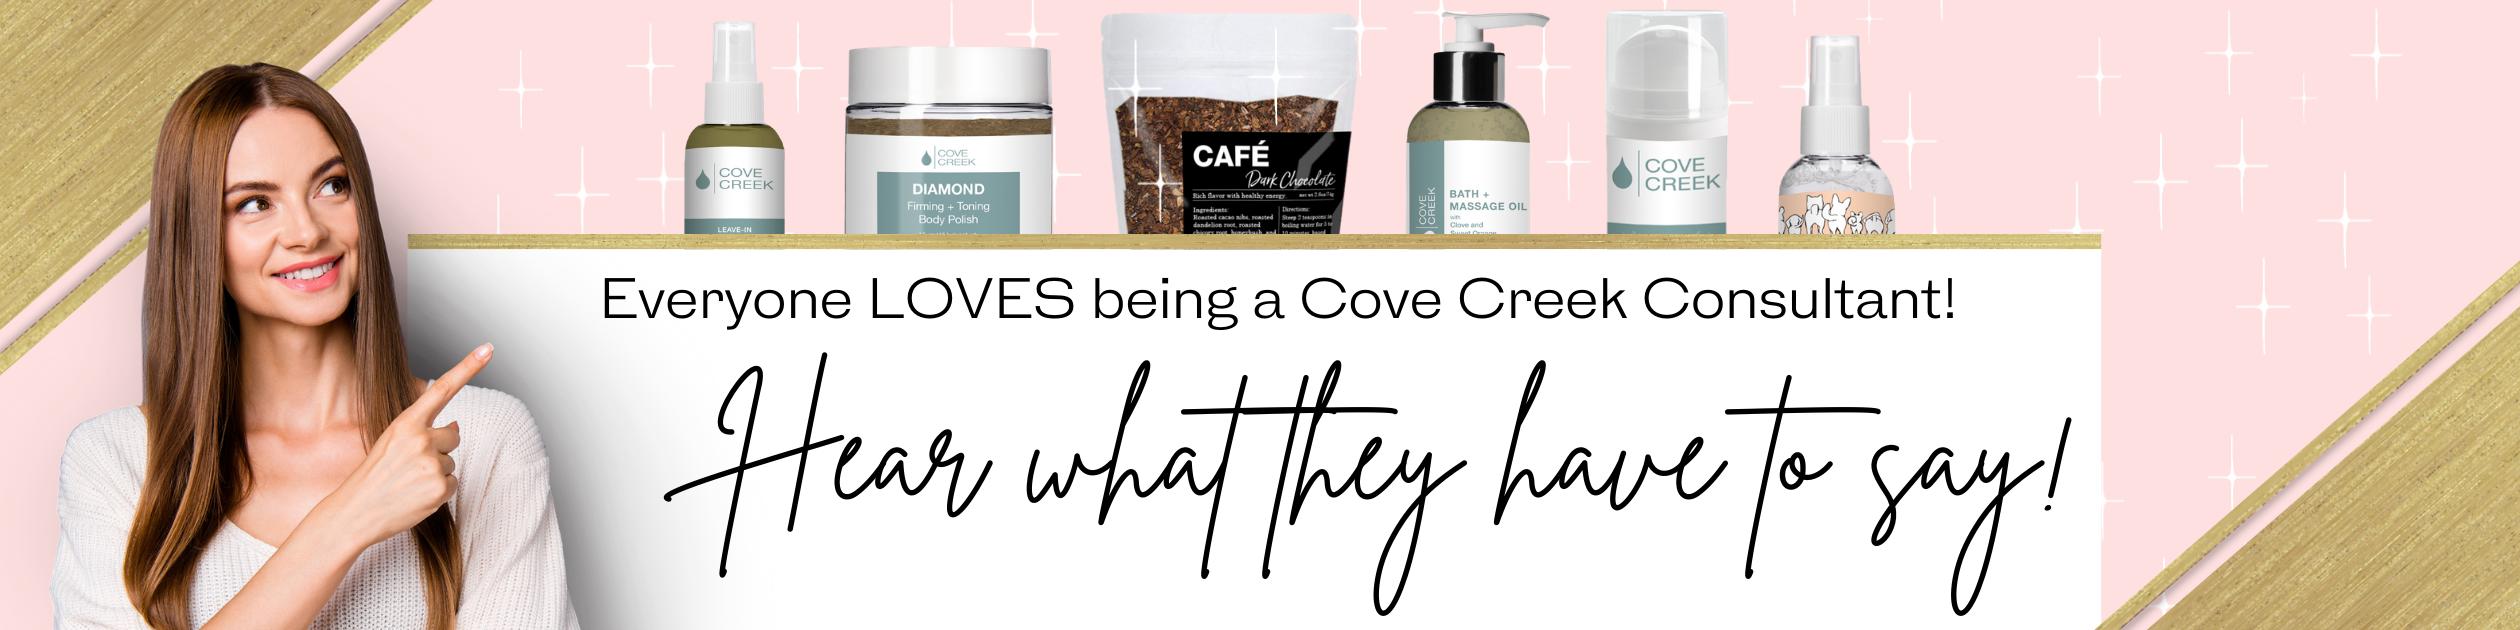 Cove Creek Testimonials